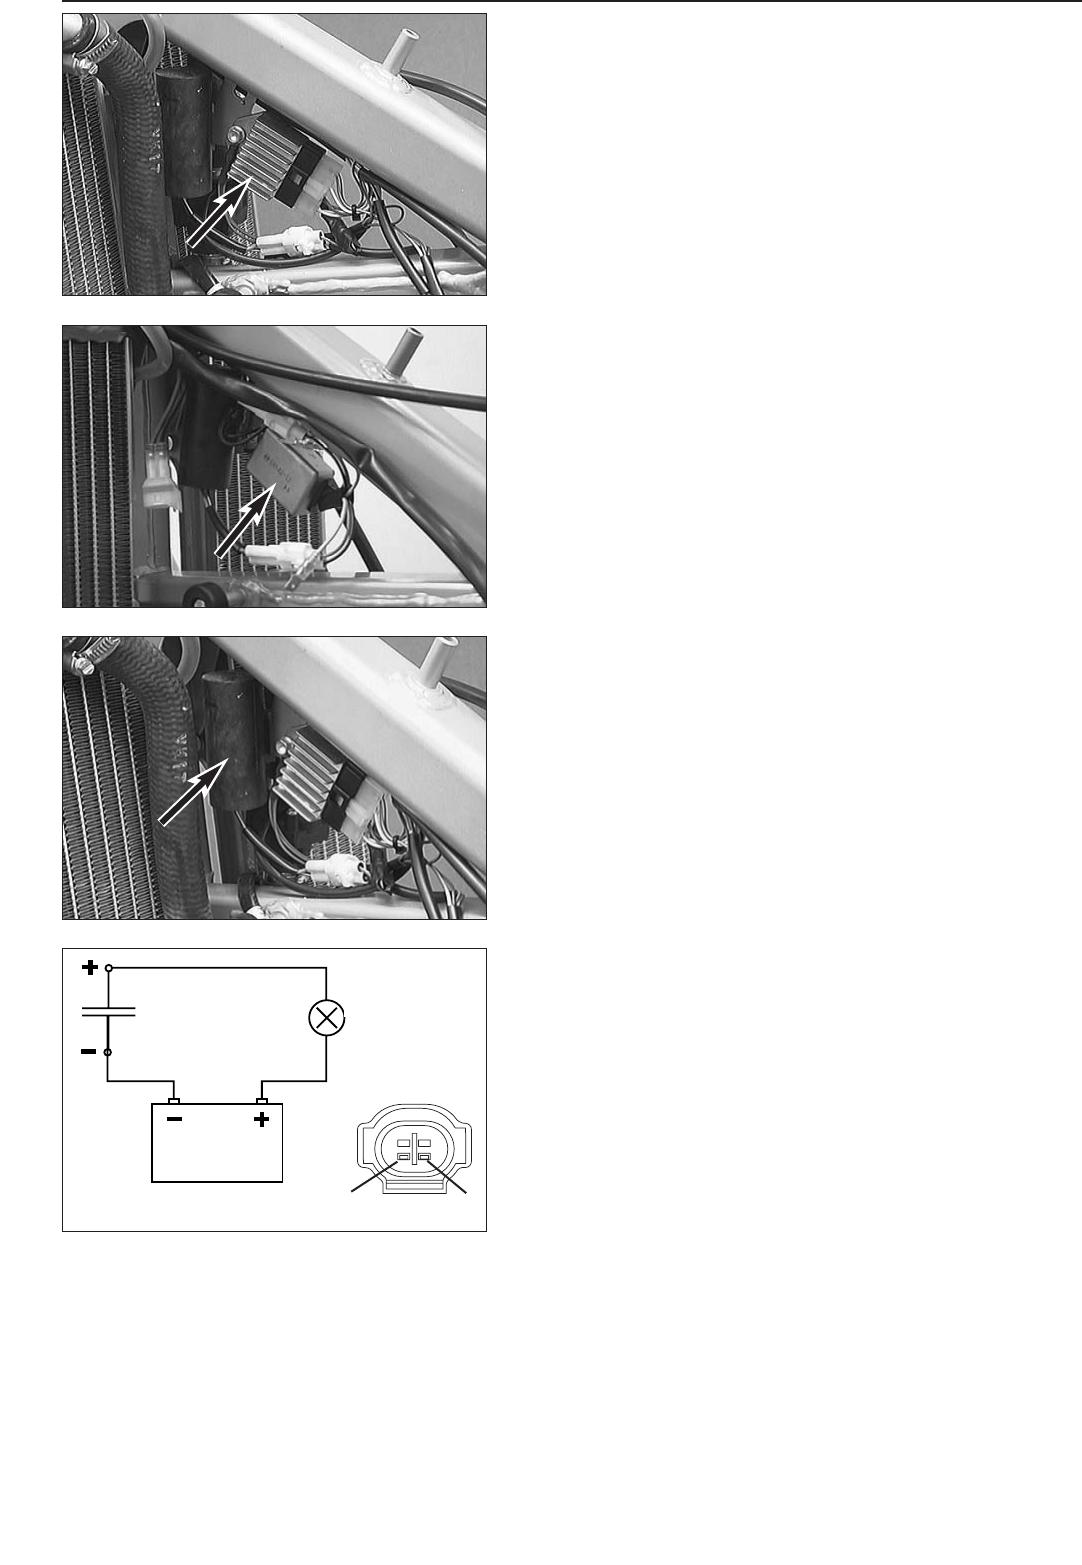 hight resolution of repair manual ktm 250 300 380 art no 3206004 e